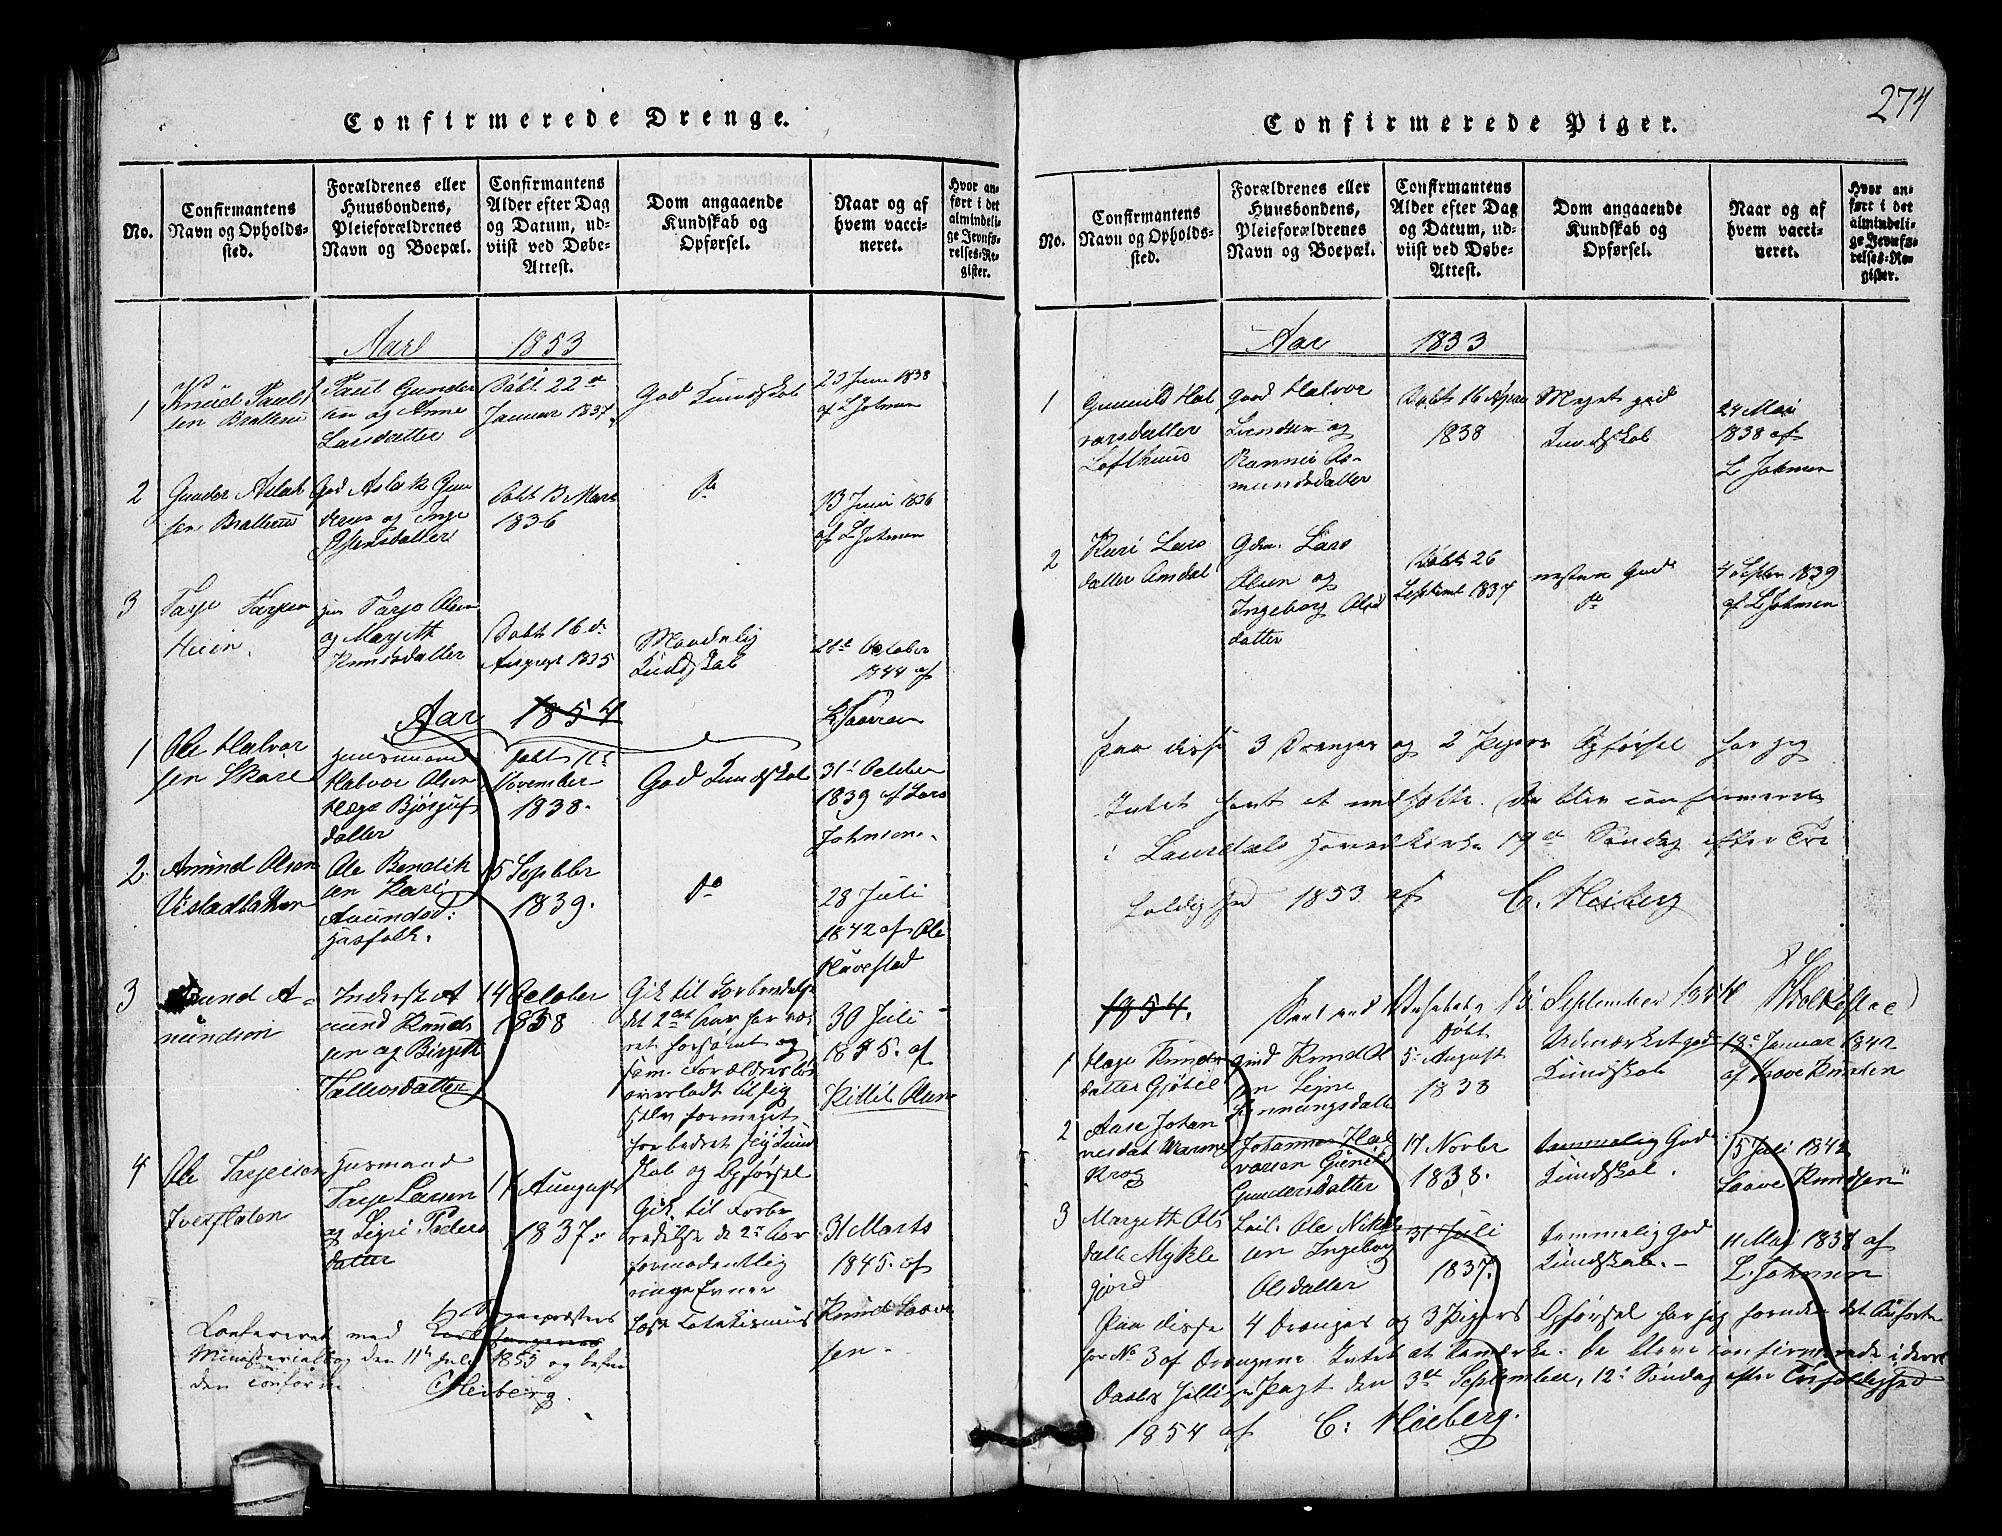 SAKO, Lårdal kirkebøker, G/Gb/L0001: Klokkerbok nr. II 1, 1815-1865, s. 274